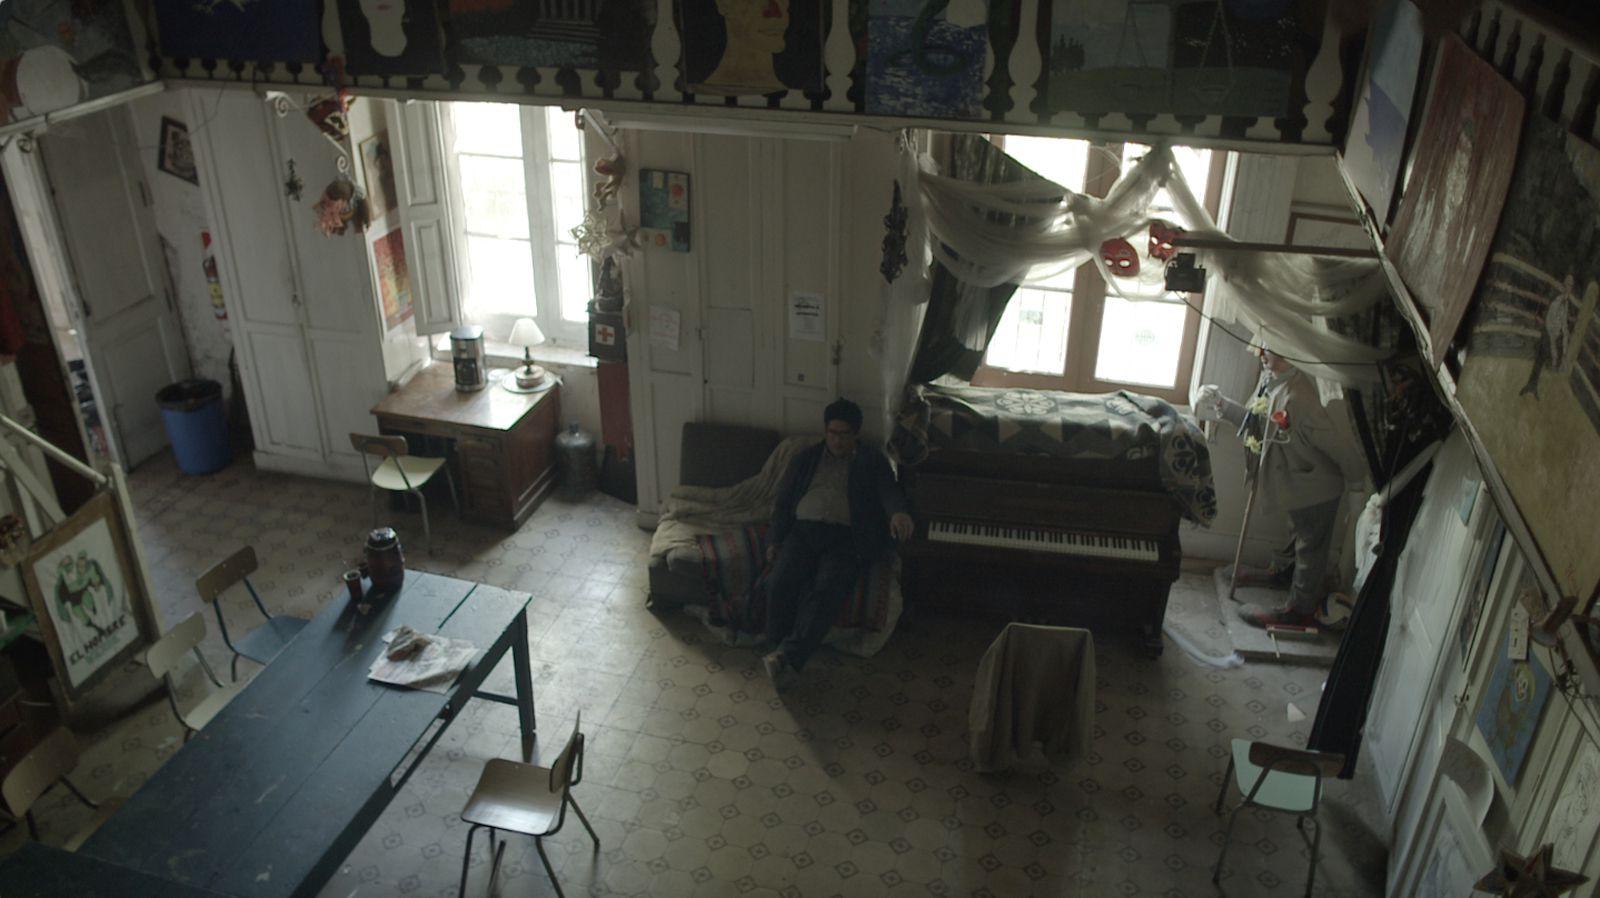 Solo (BANDE-ANNONCE) Documentaire de Artemio Benki - Le 5 mai 2021 au cinéma